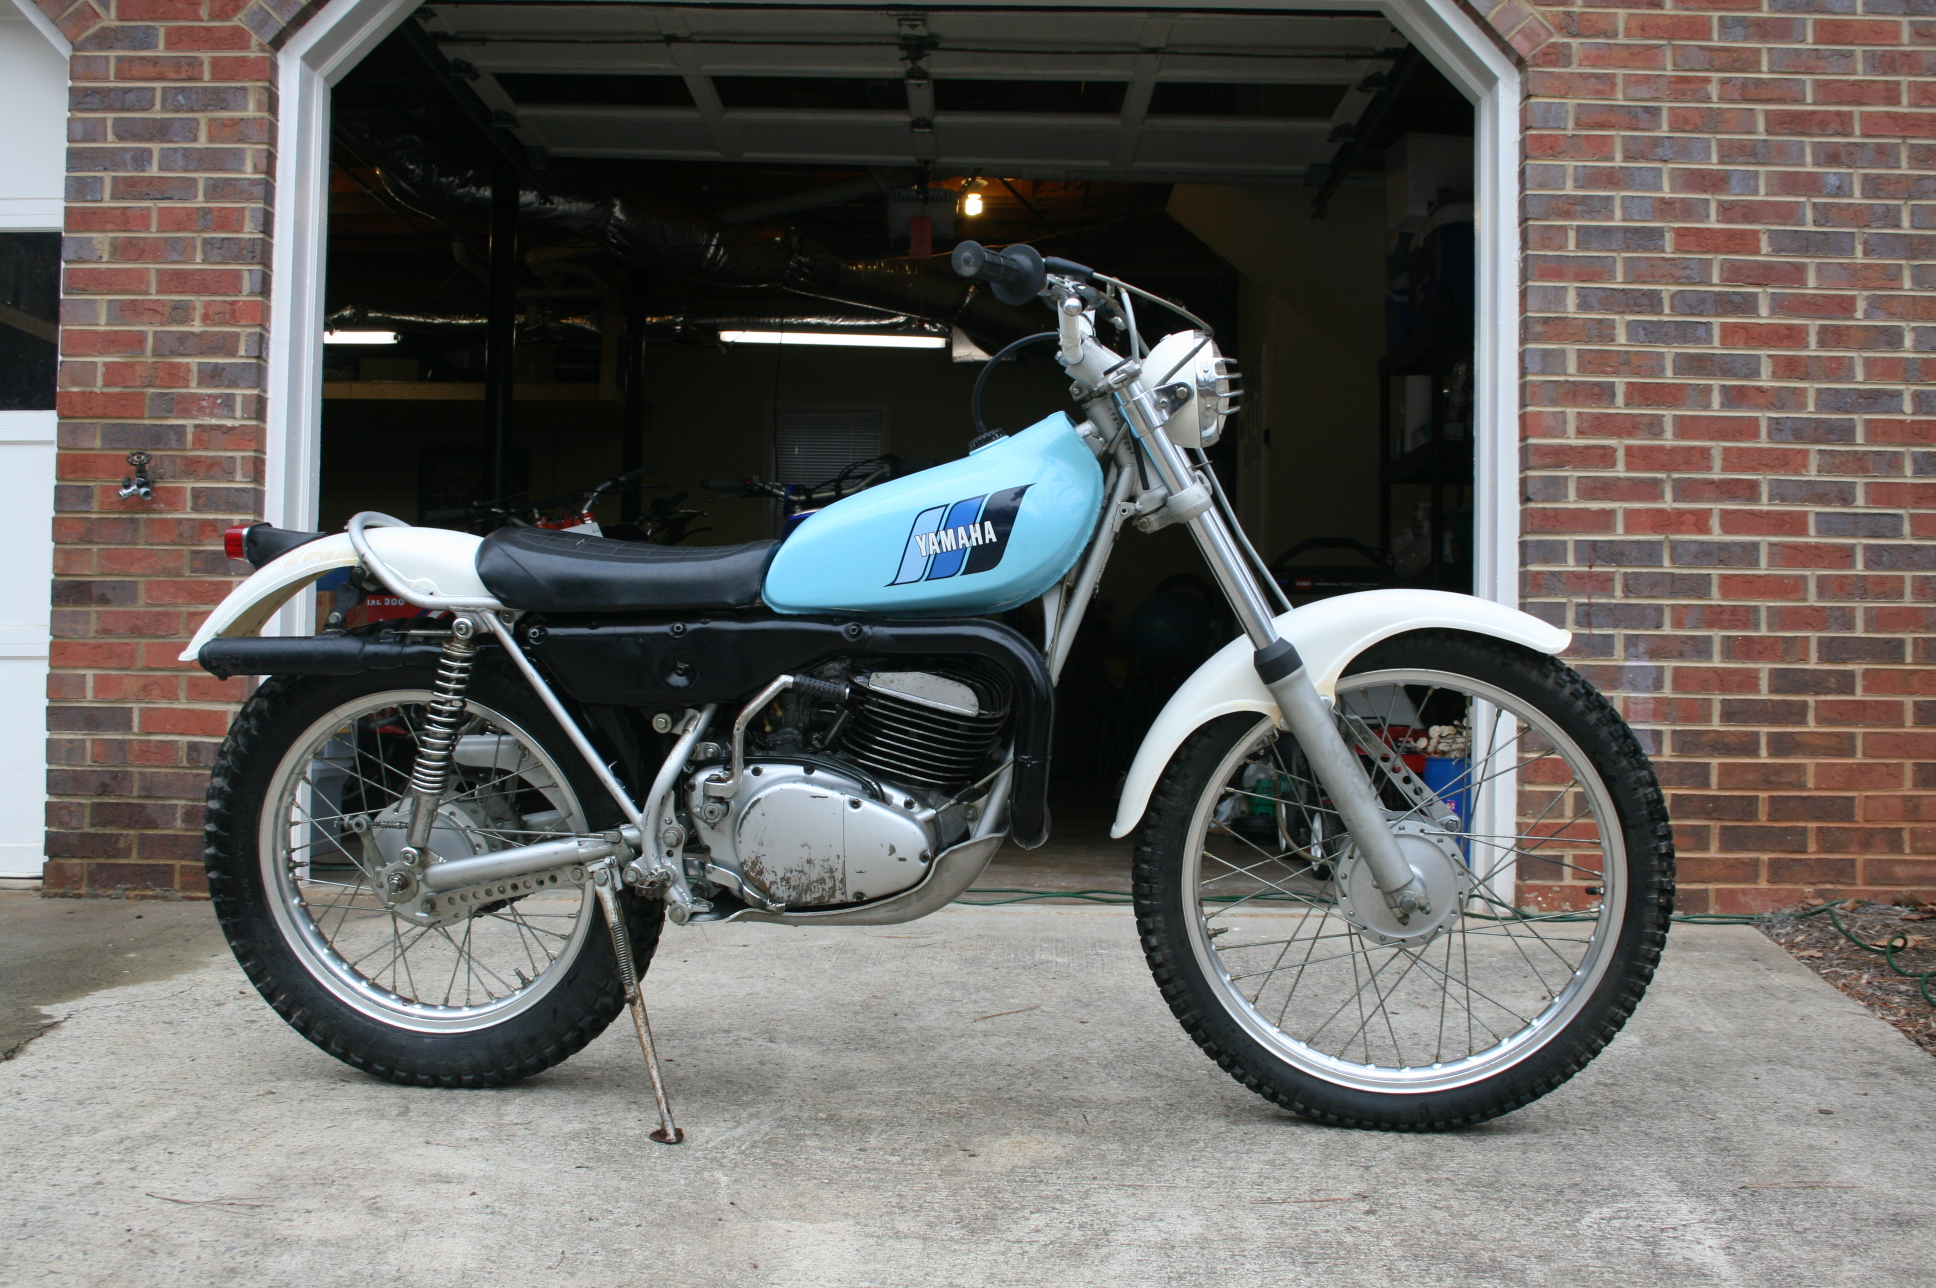 1977 yamaha ty 250 d trials bike right flickr photo. Black Bedroom Furniture Sets. Home Design Ideas